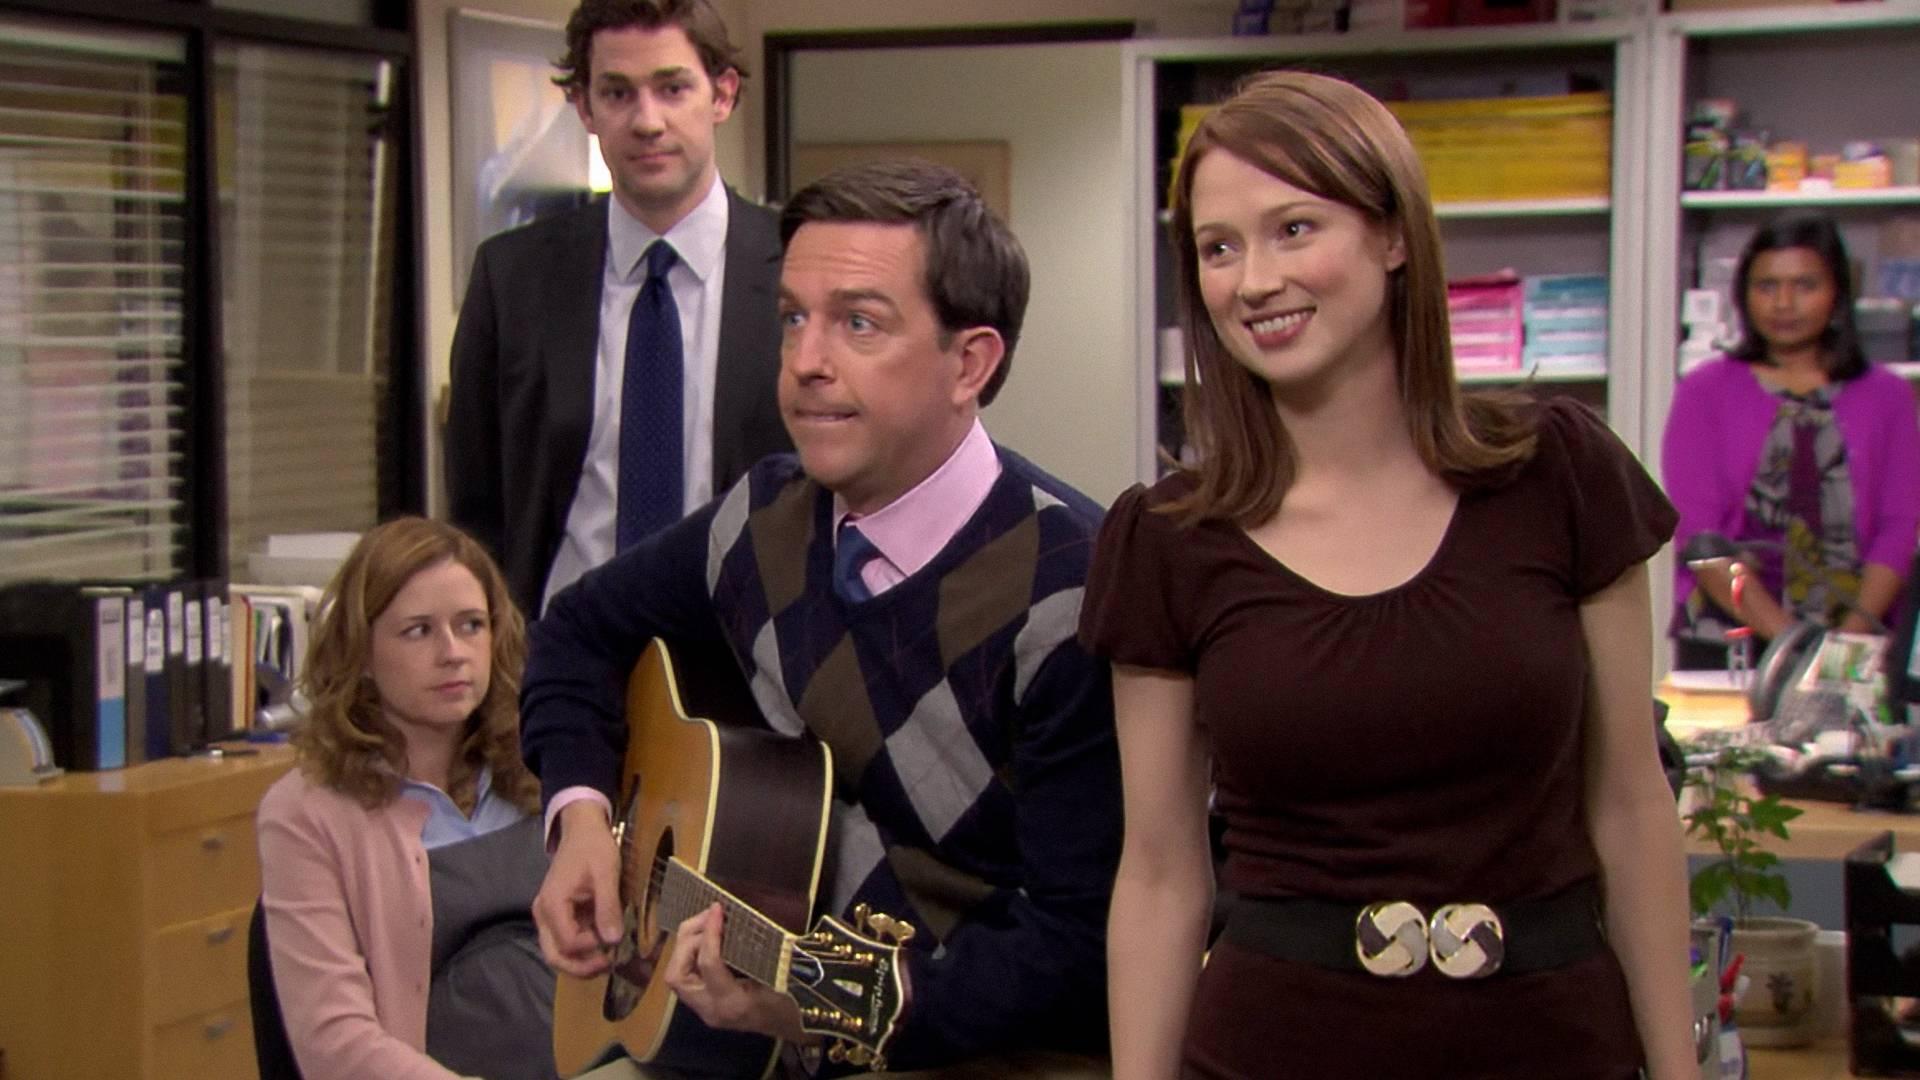 The Office Season 6 Episode 15